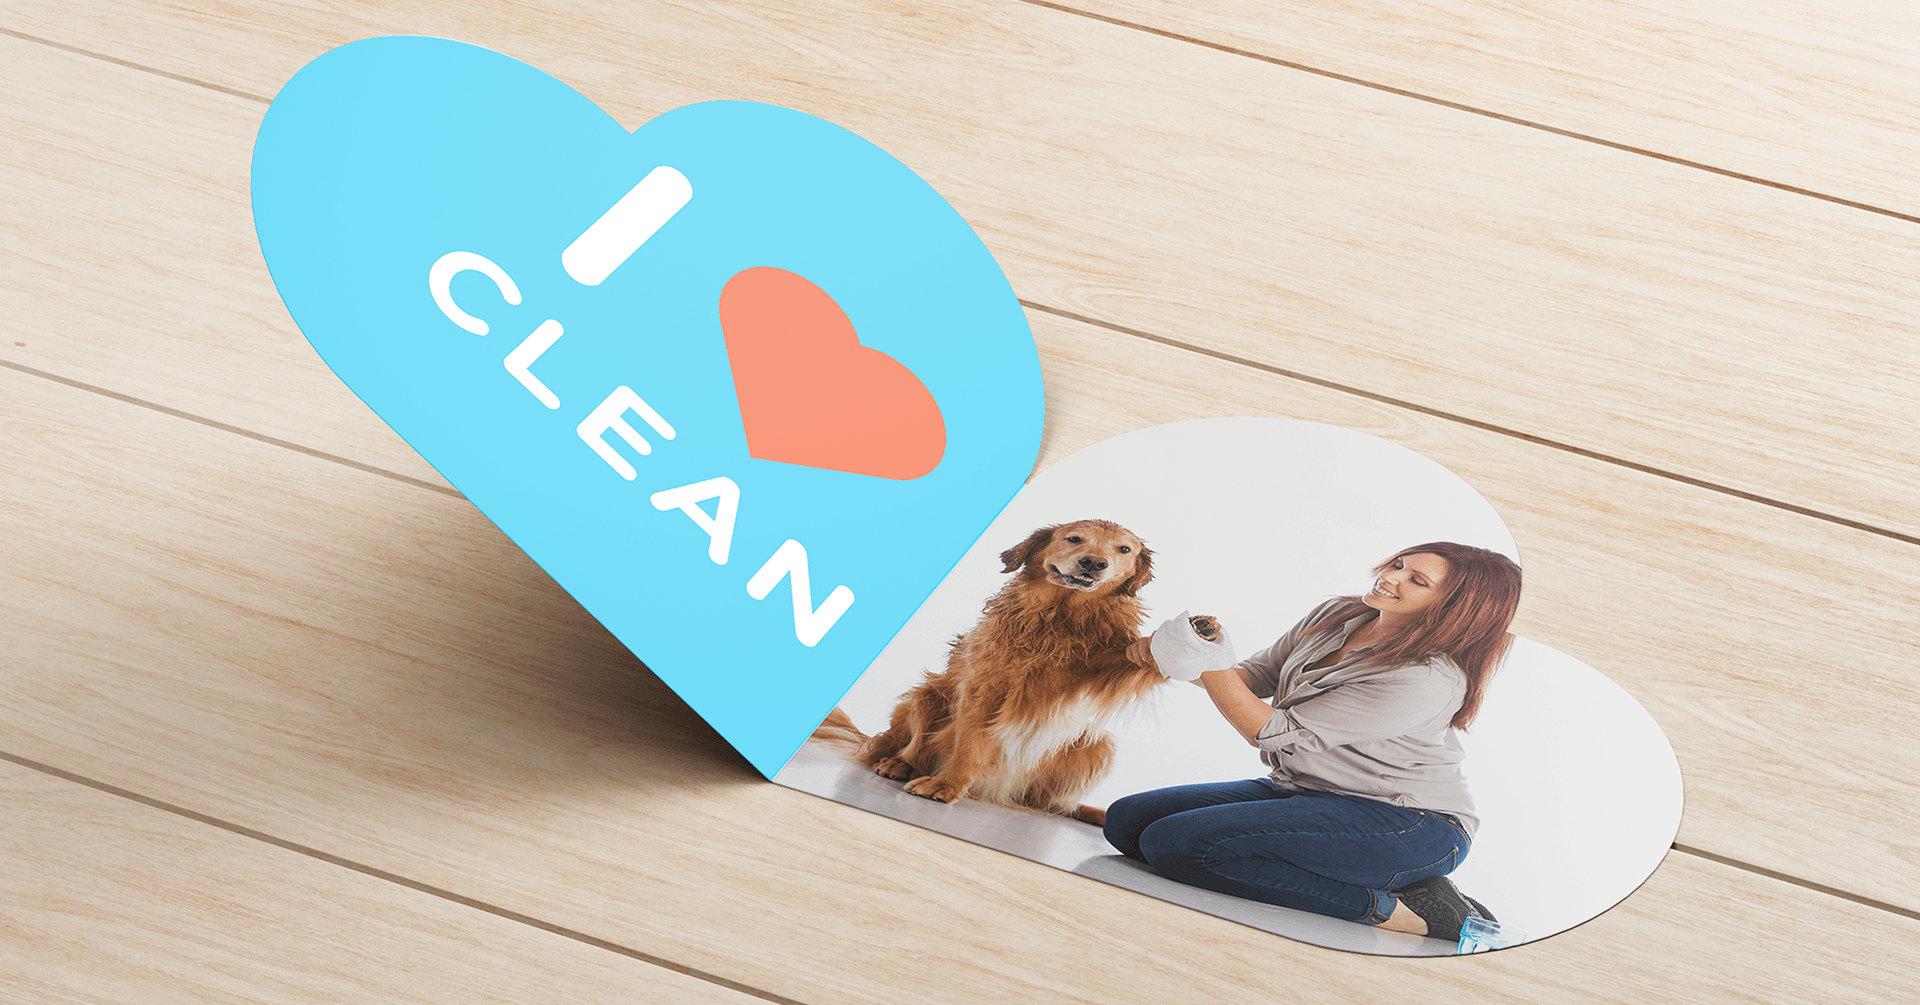 Scrubby I Love Clean - iDesign Branding